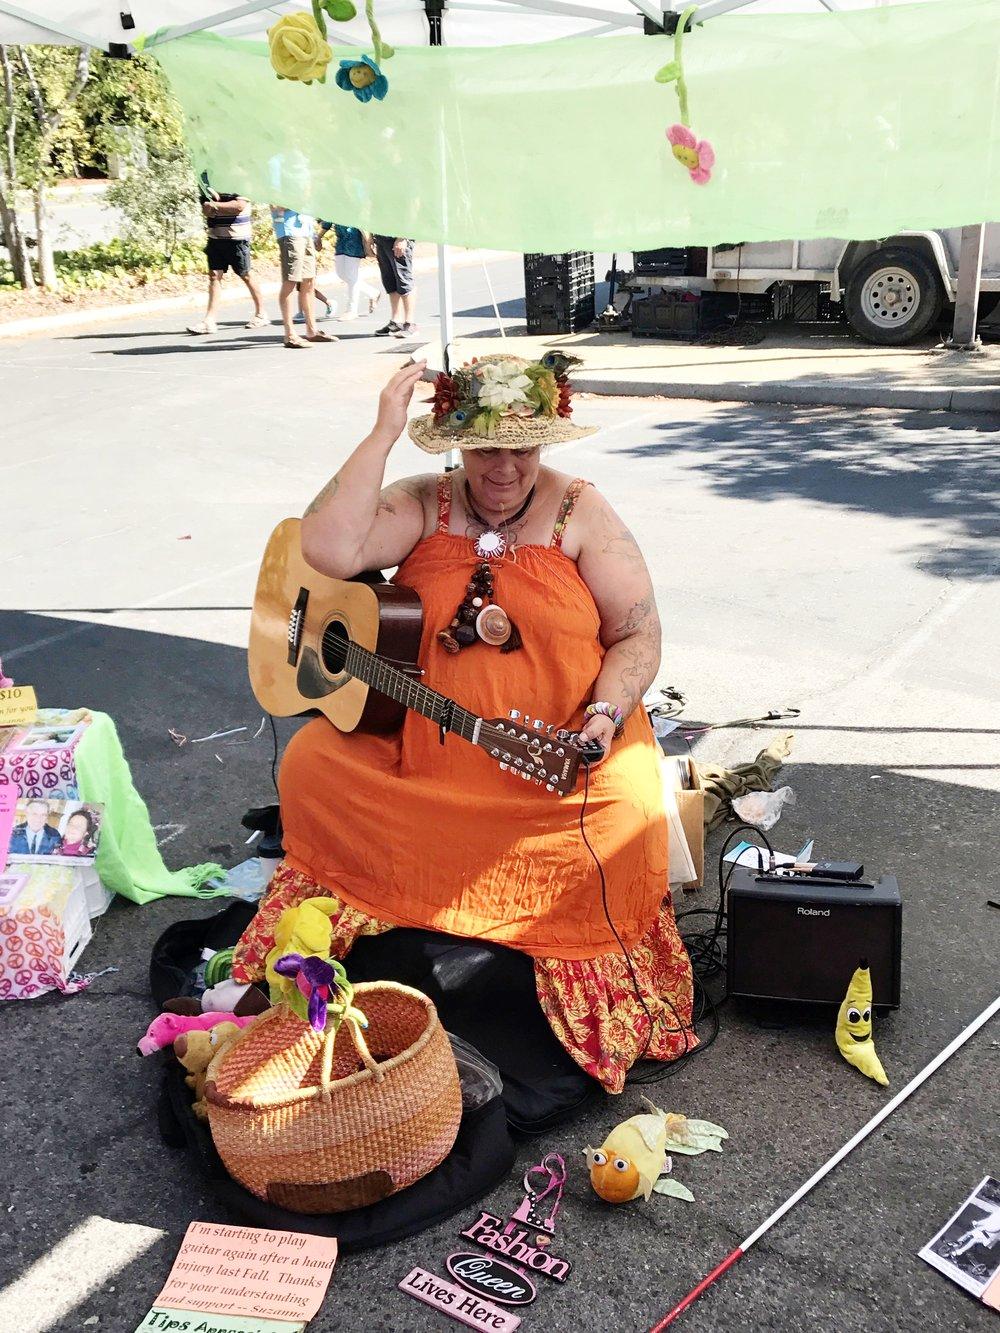 Big Singer in Orange IMG_2295.jpg